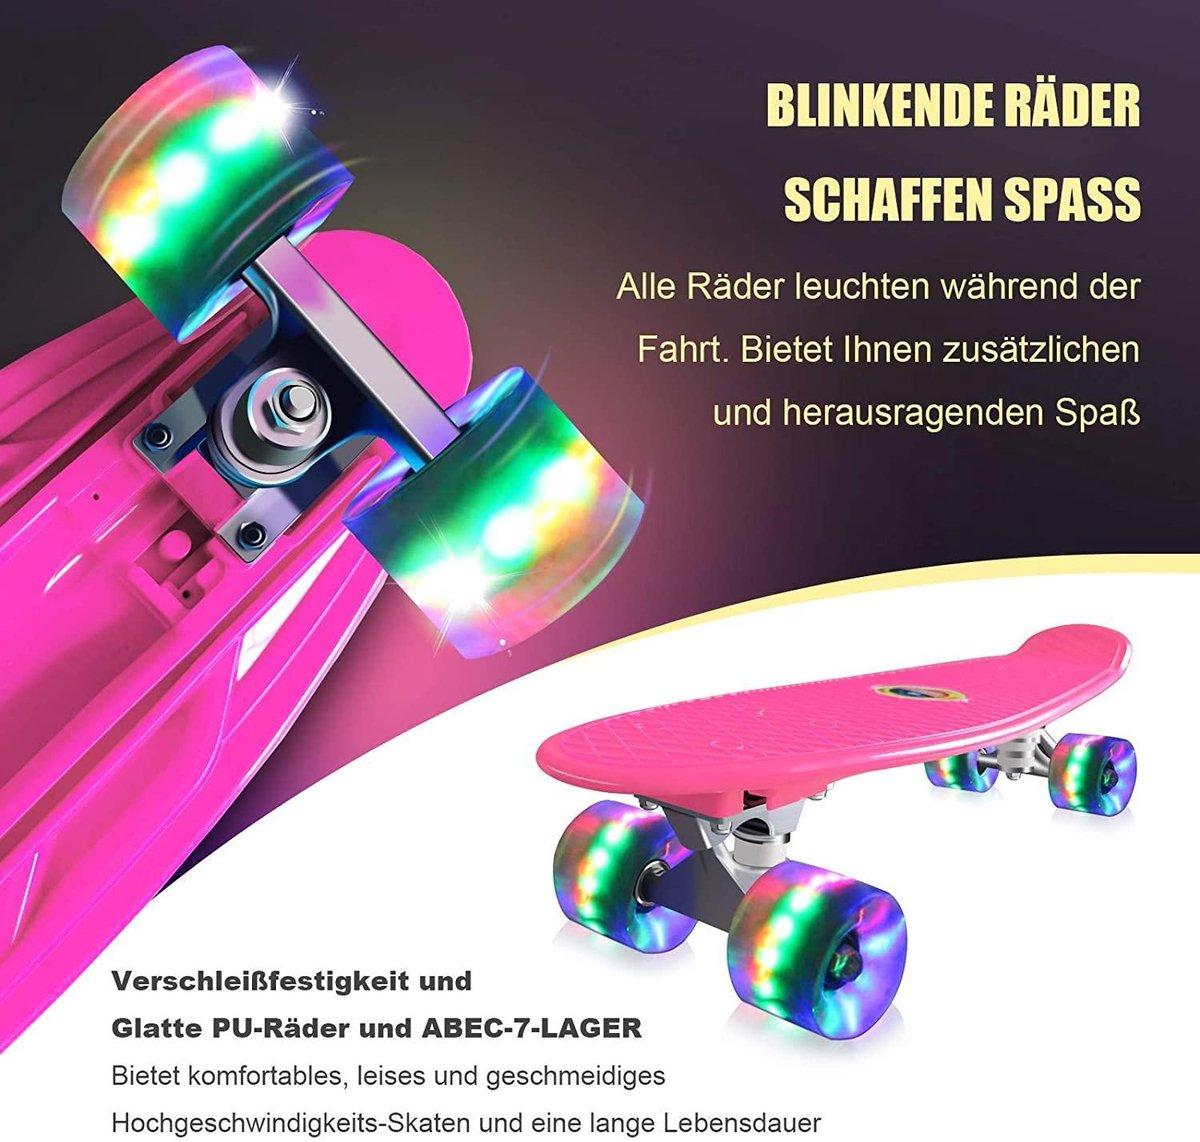 Skateboards Compleet 55 cm Mini Cruiser Retro Skateboard voor kinderen Jongens Meisjes Jeugd Volwassenen Beginners, LED Knipperende Wielen met Alles-in-één Skate T-Tool